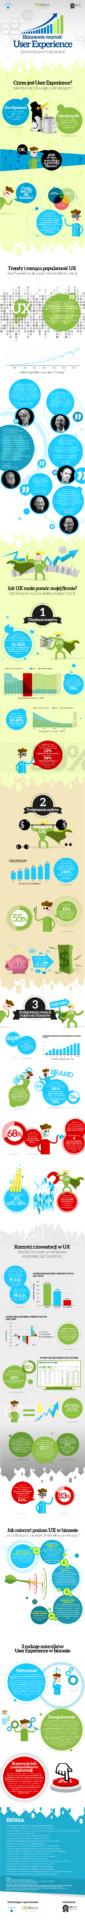 Biznesowa-Wartosc-User-Experience-Infografika